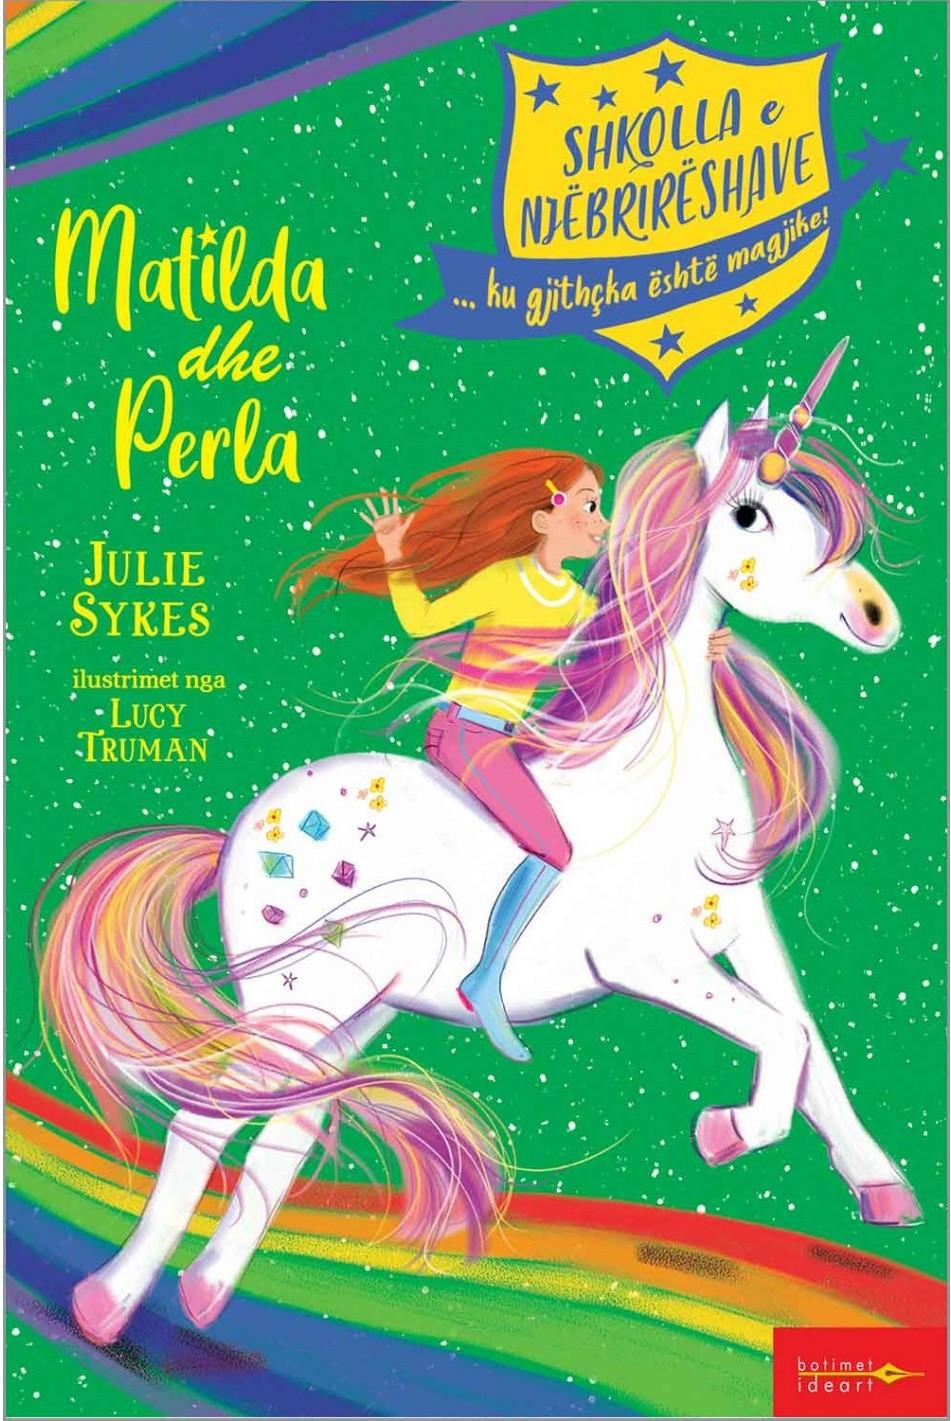 Shkolla e njebrireshave - Matilda dhe perla